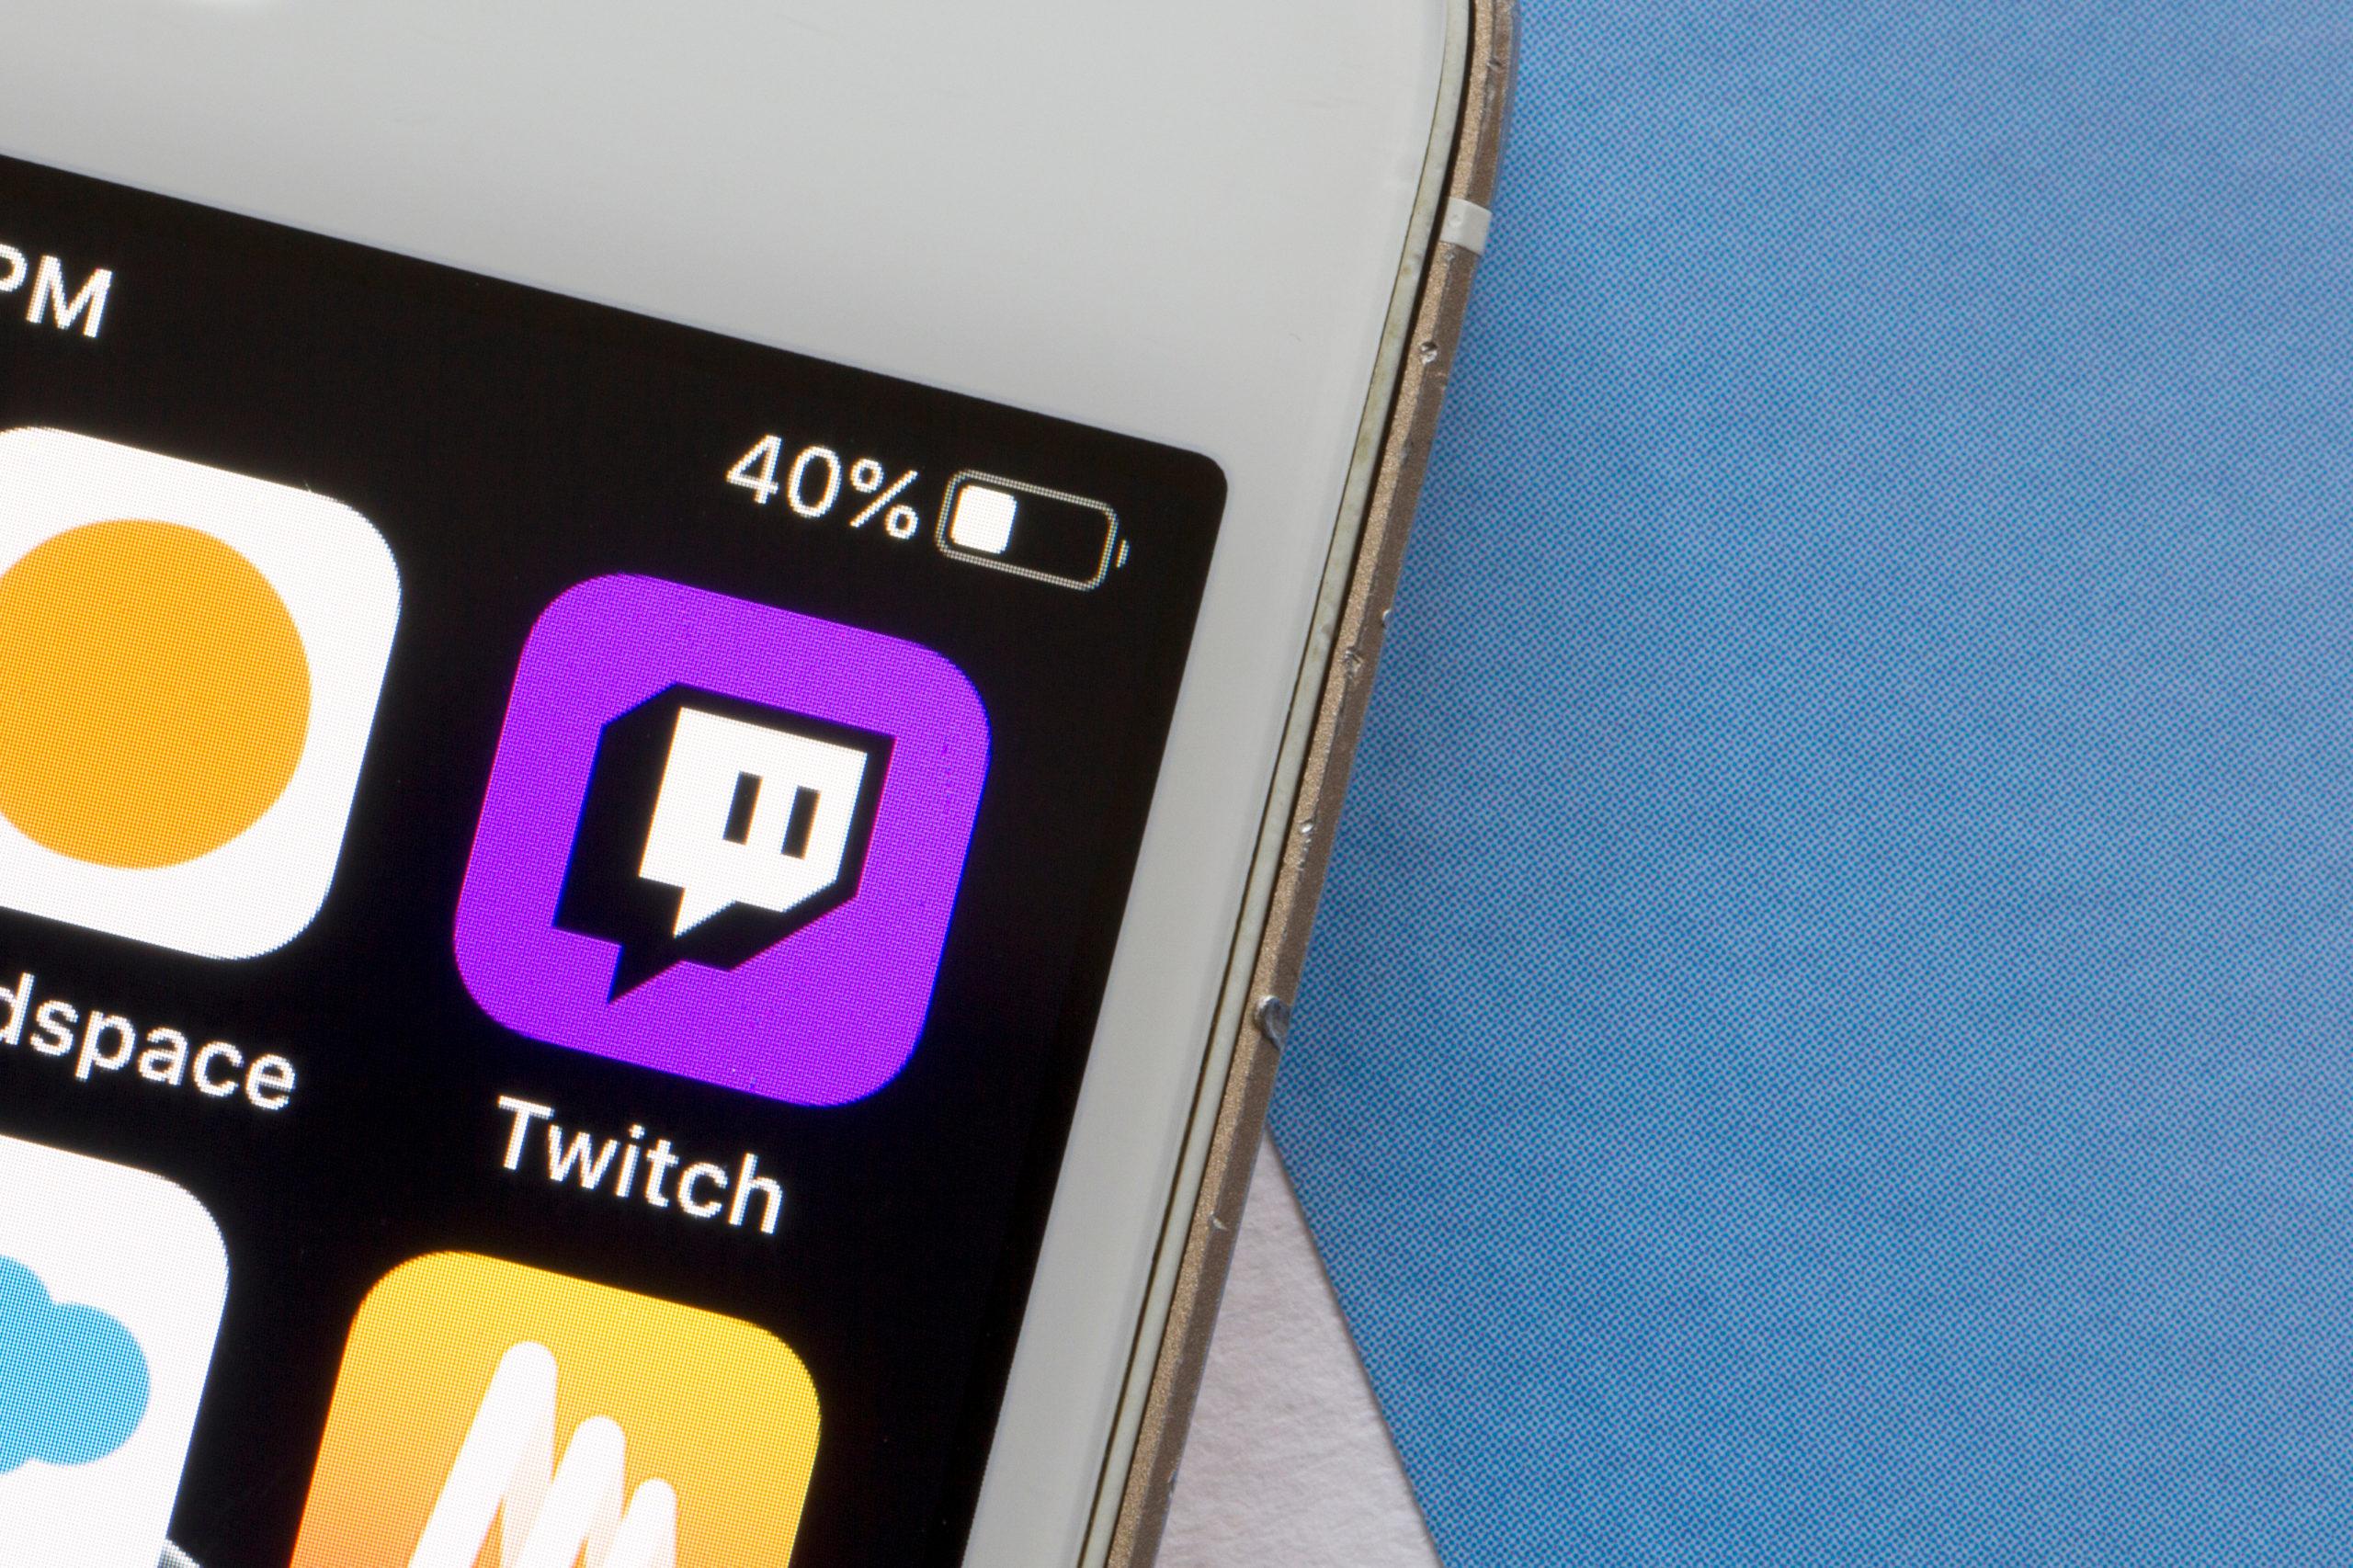 aplicaciones recomendadas para gamers